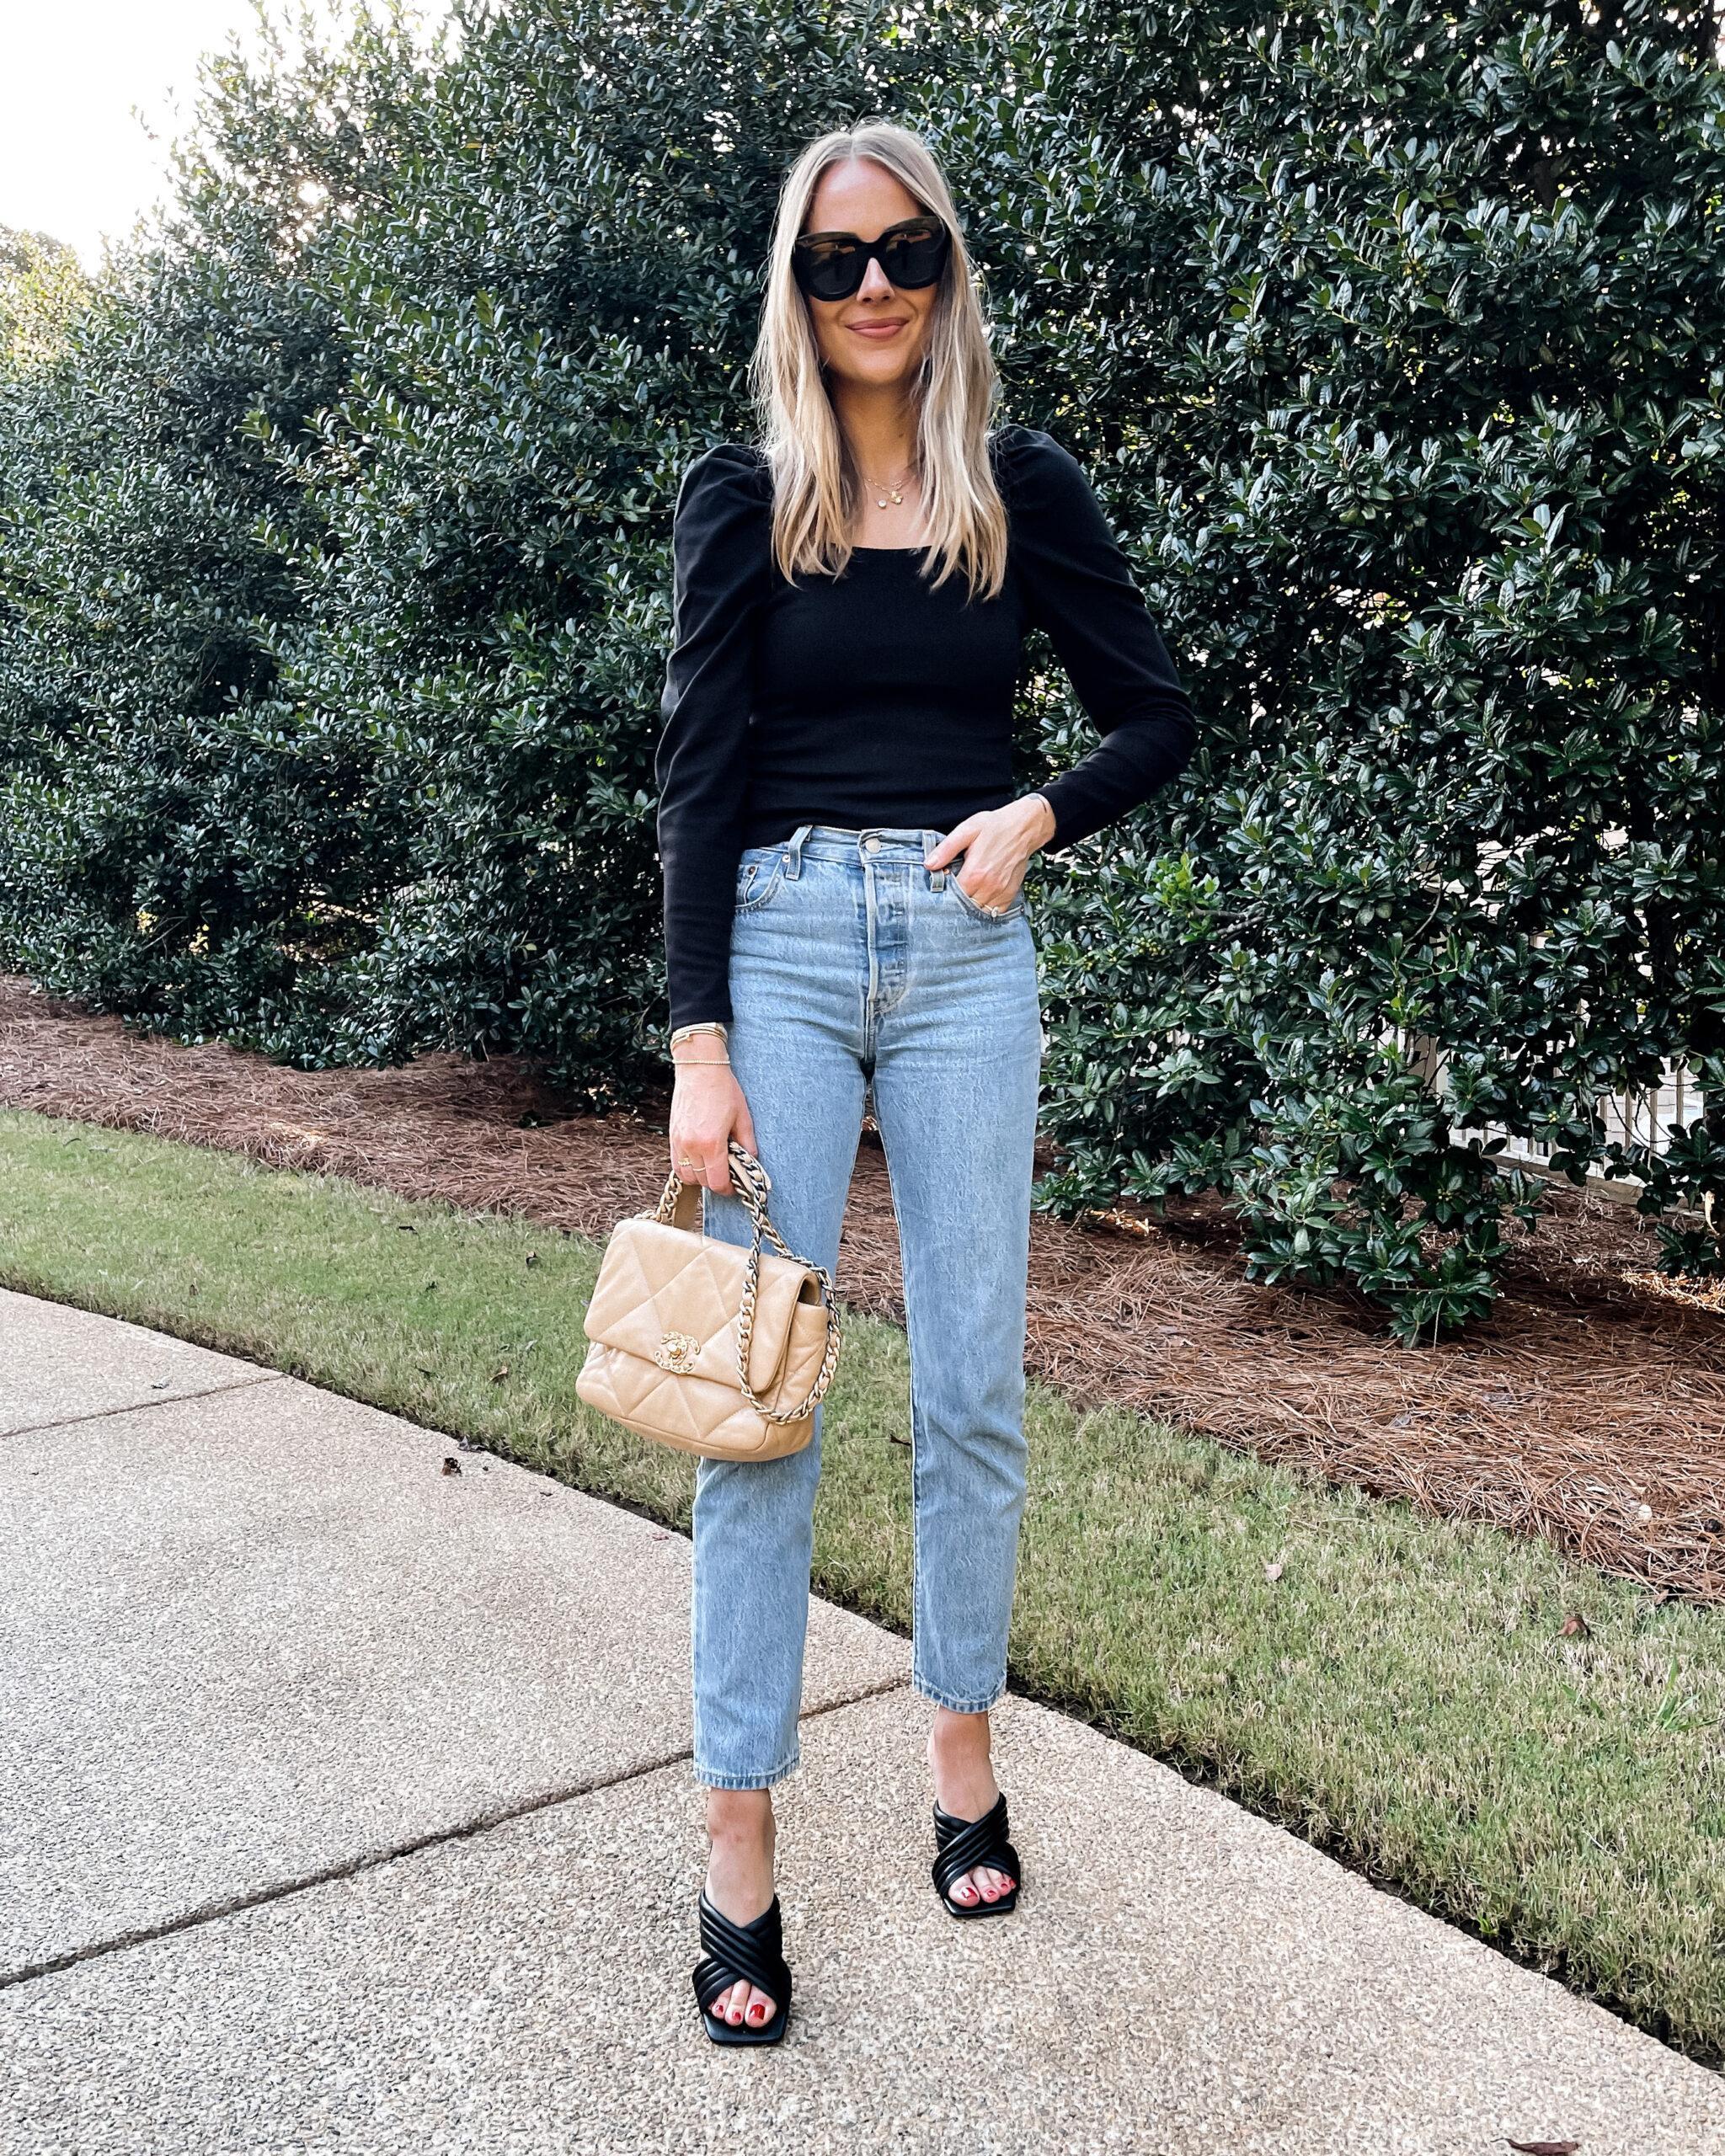 Fashion Jackson Wearing Black Puff Sleeve Top Levis 501 Jeans Black Heeled Sandals Chanel 19 Beige Handbag